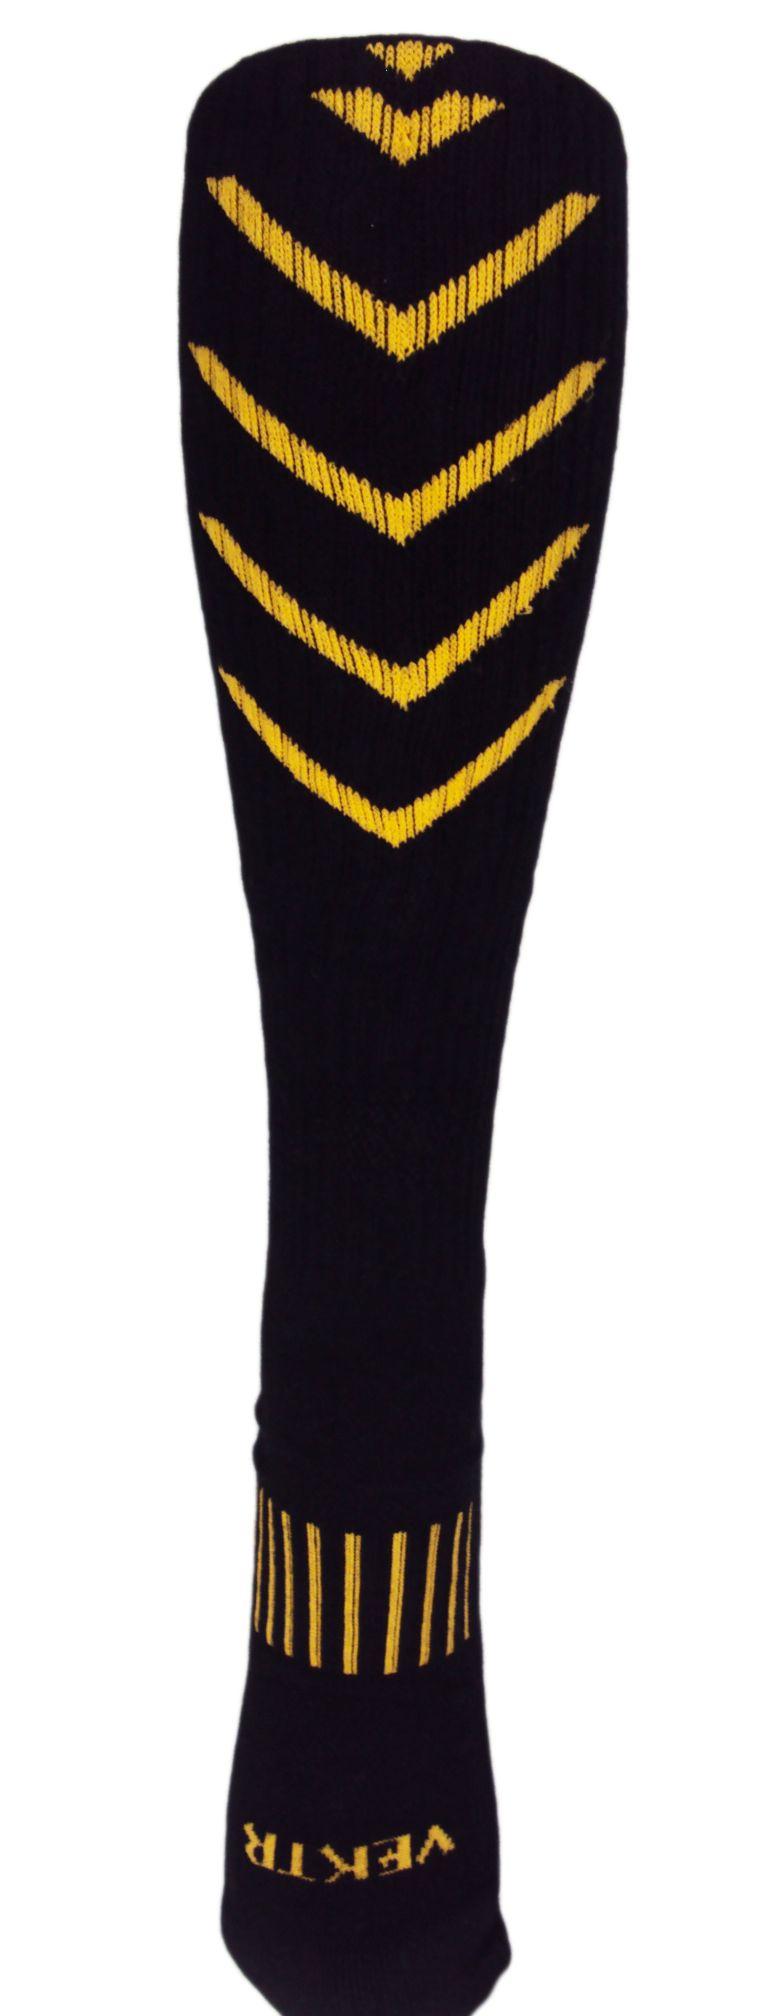 06c7136ced4  16 MOXY Socks Knee-High Black with Gold and Blood Red Ultimate VEKTR Premium  Deadlift Socks